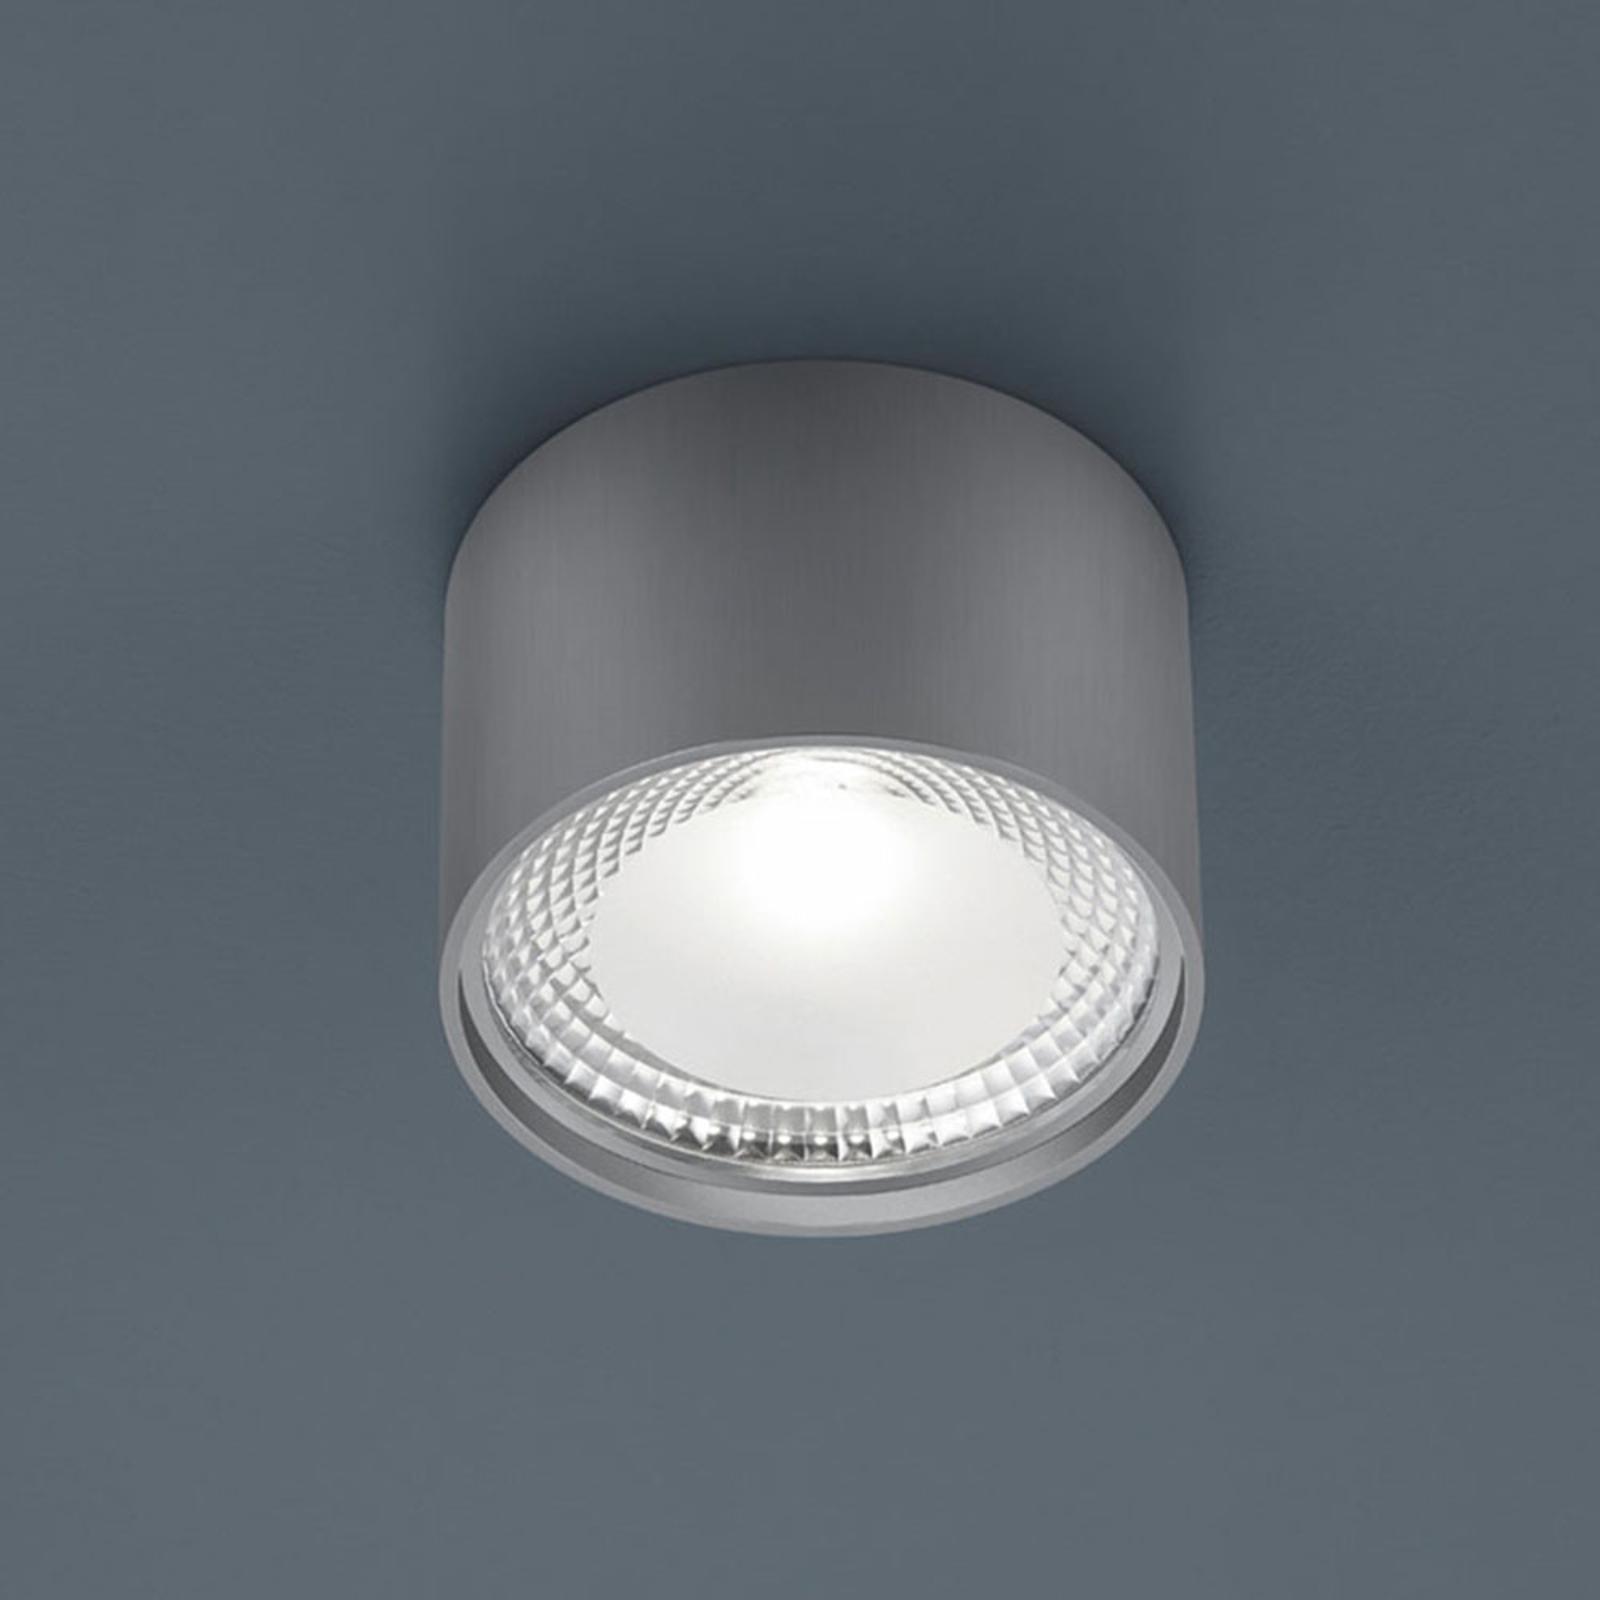 Helestra Kari LED plafondlamp, rond, nikkel